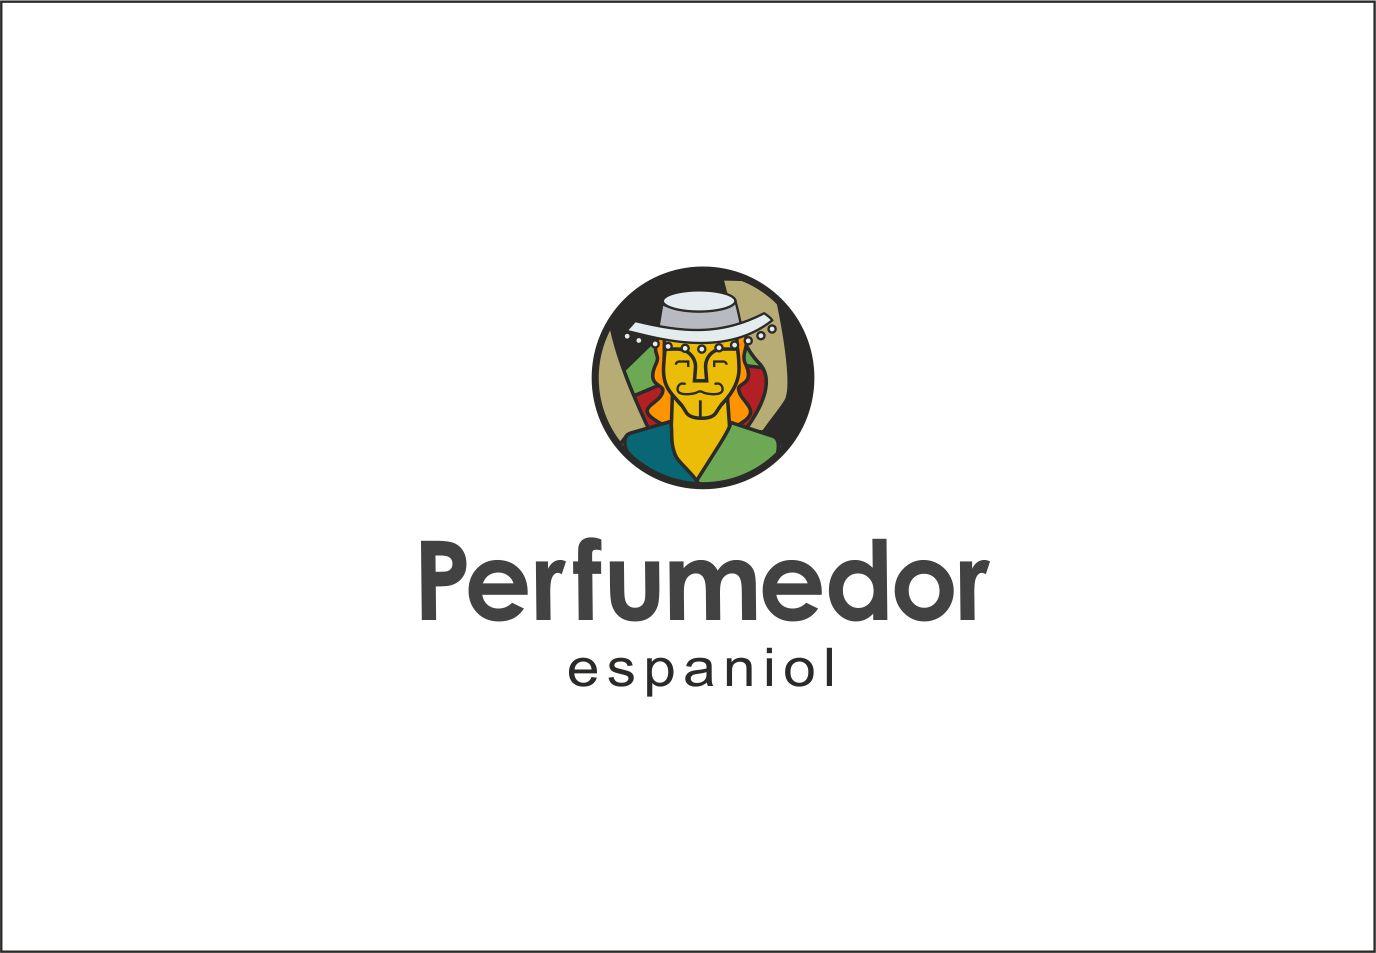 Логотип для интернет-магазина парфюмерии фото f_8995b470c5b5cec6.jpg